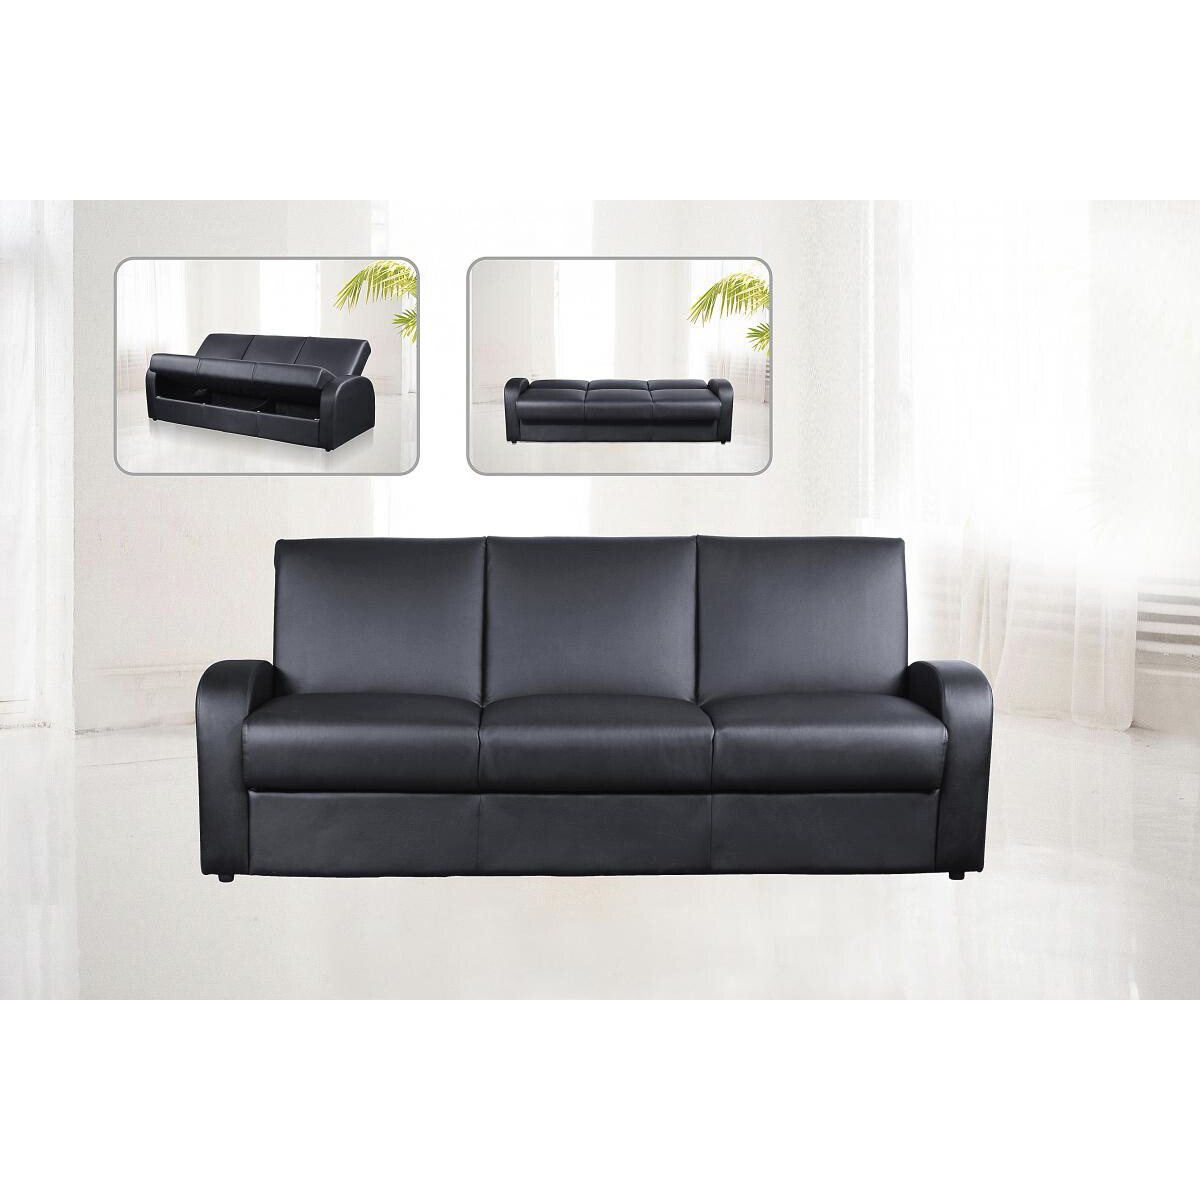 Kimberly sofa bed (with storage)